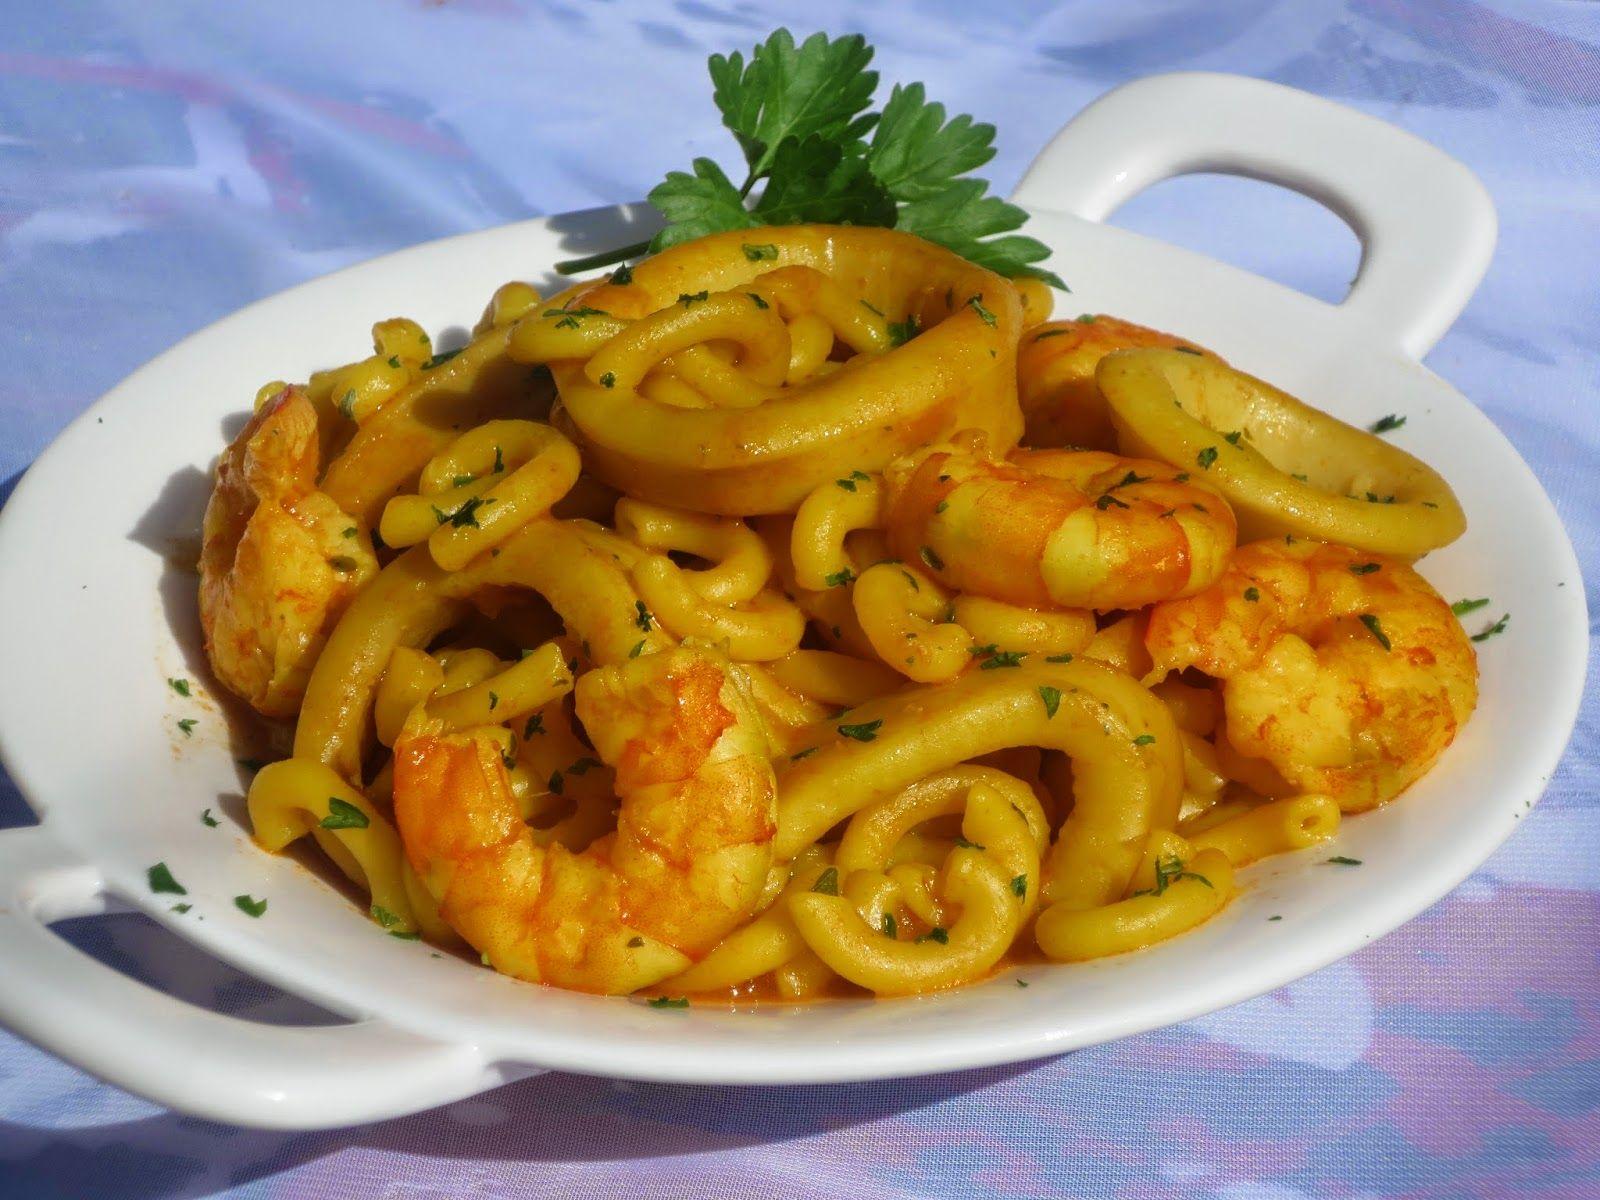 Fideu de calamares ana sevilla olla gm pescado pasta paella y seafood dishes - Ana cocina facil ...